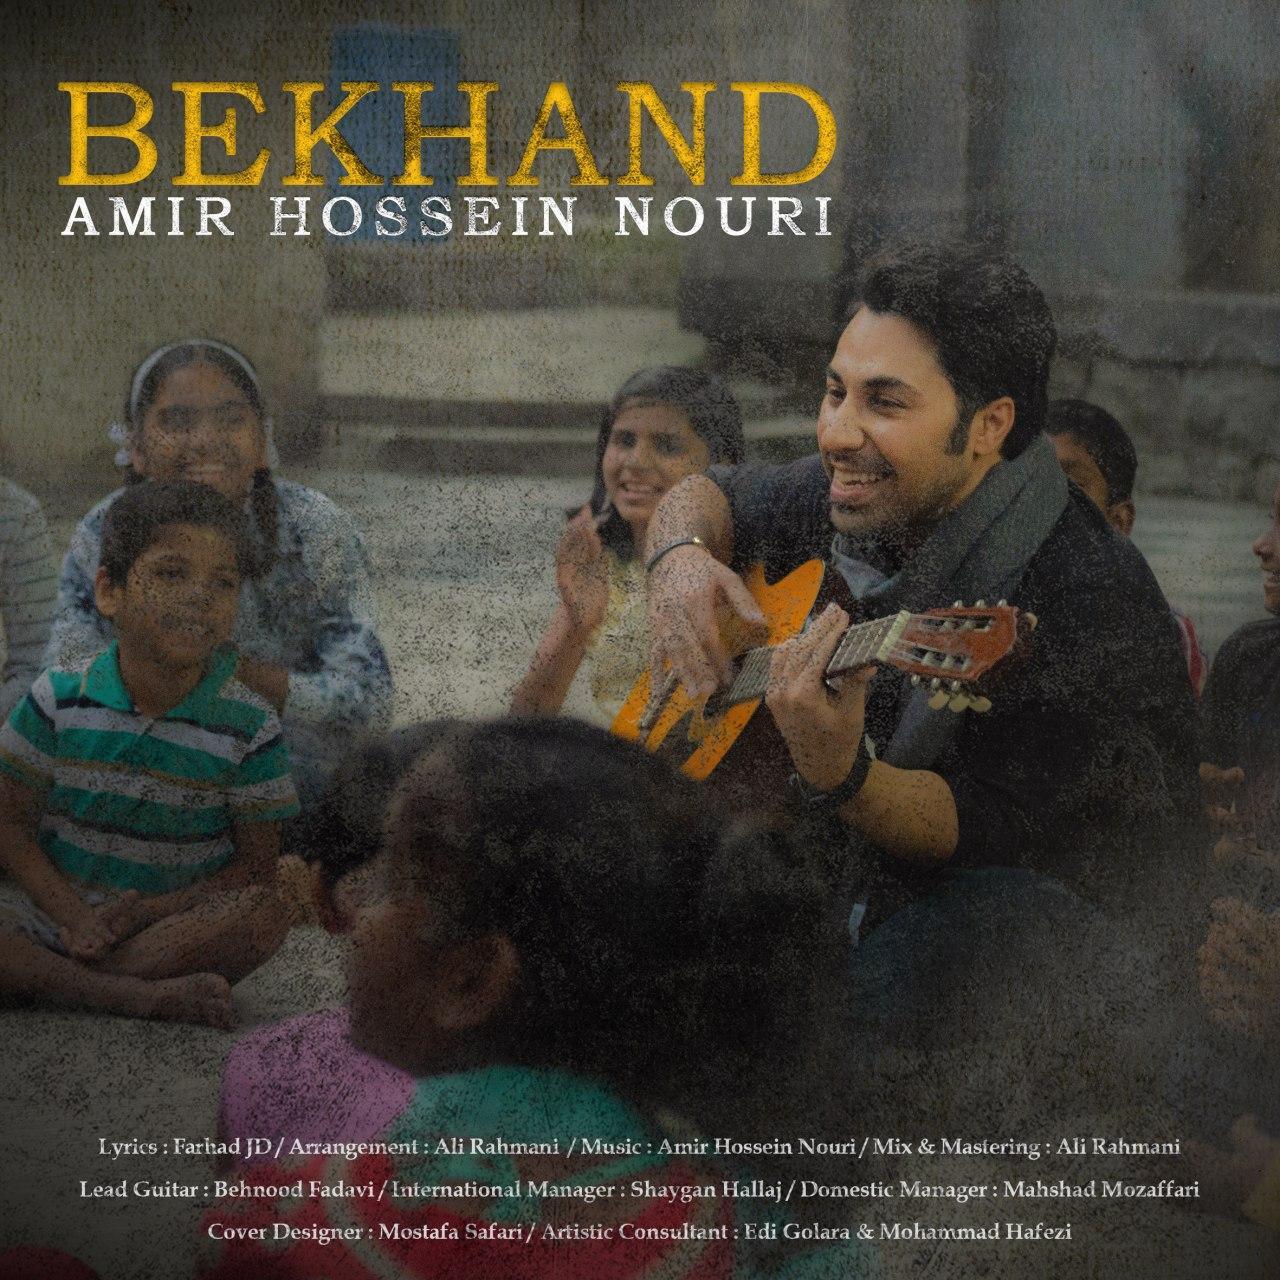 Amir Hossein Nouri – Bekhand